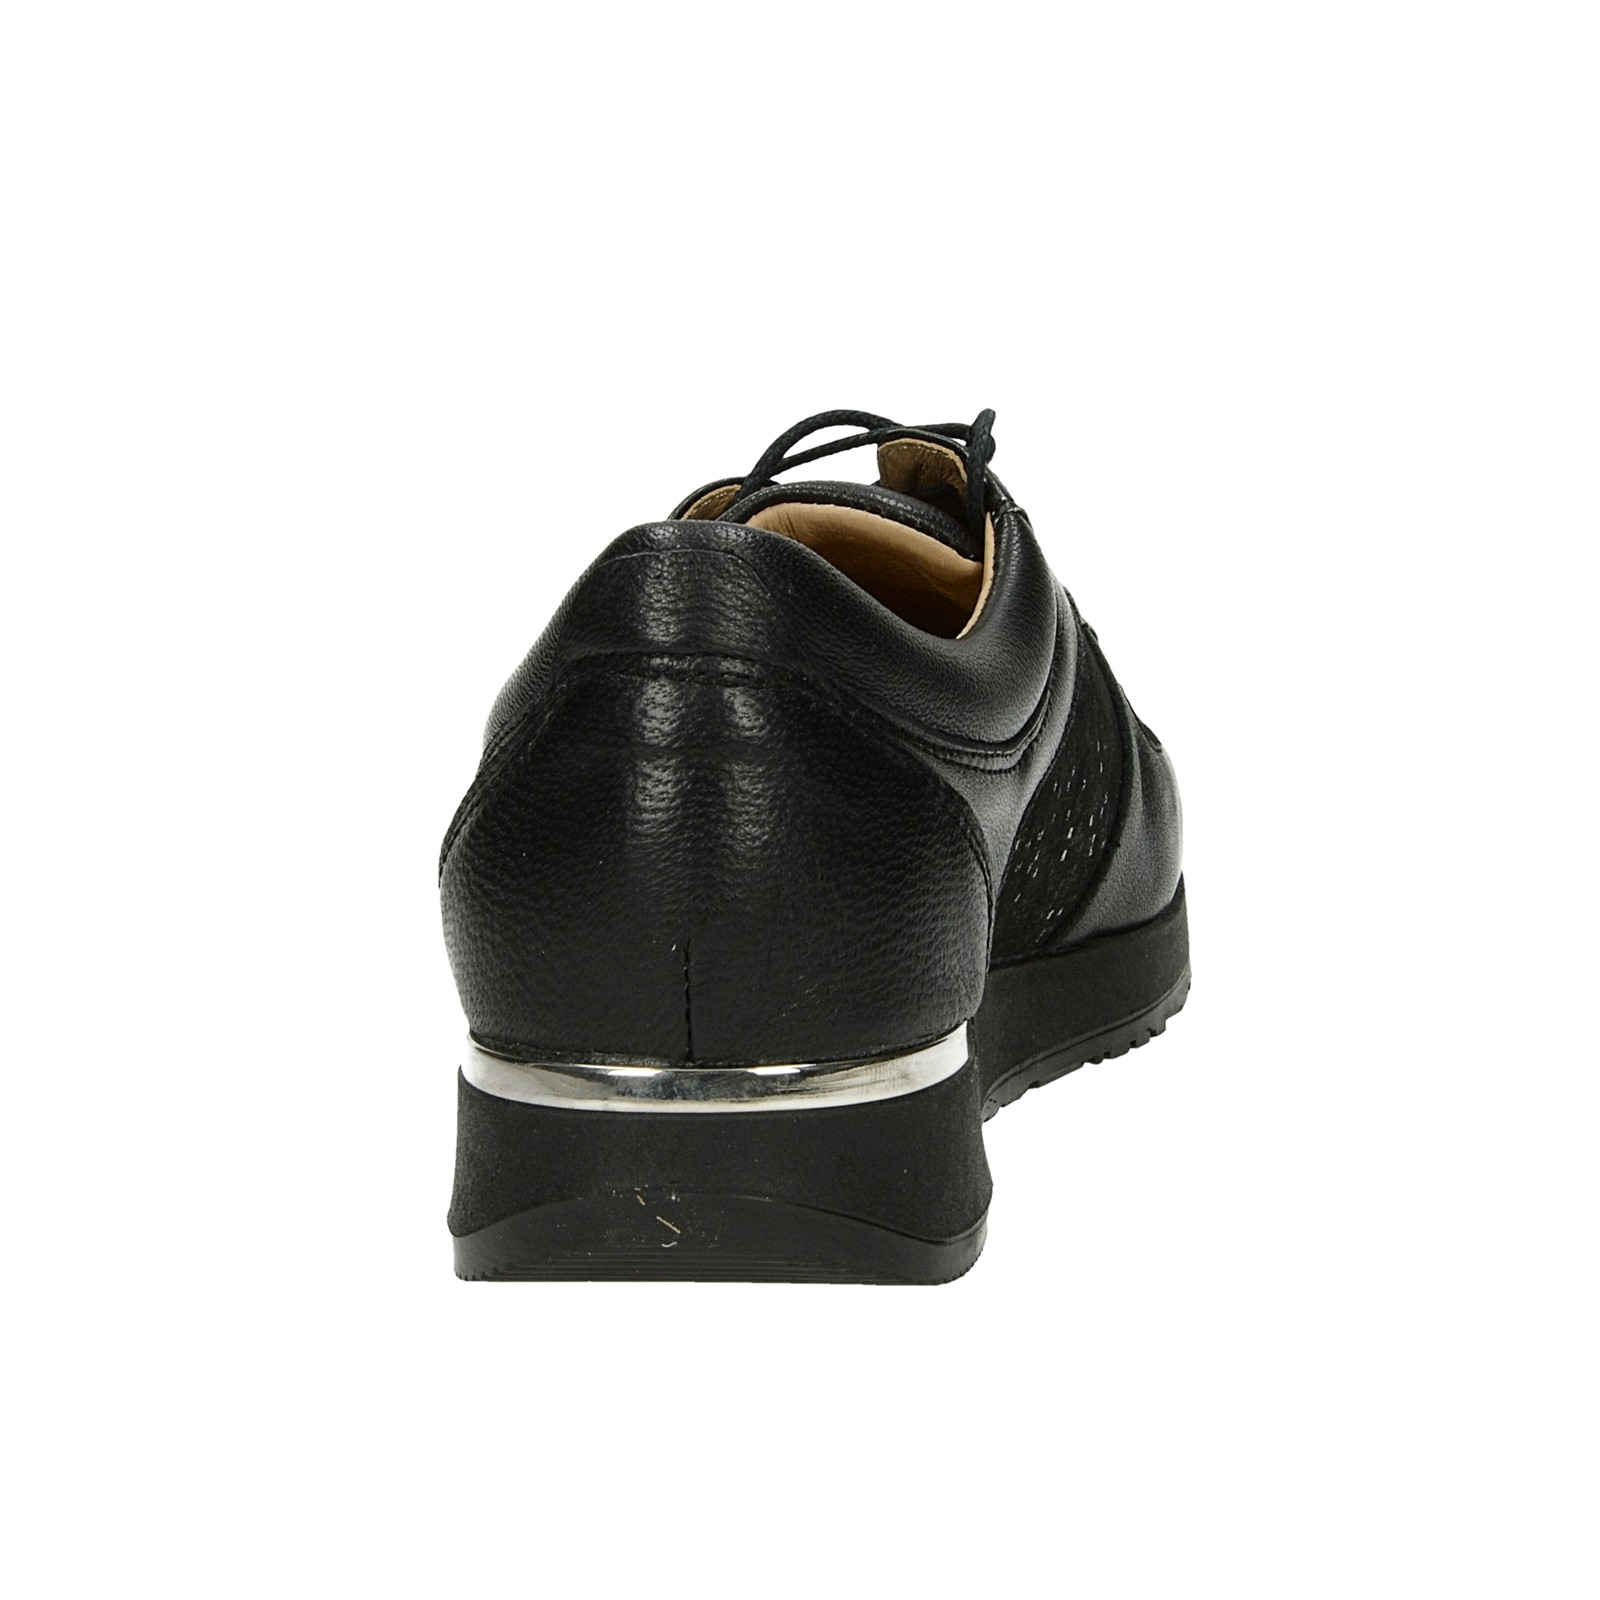 d8874610e4 ... Olivia shoes dámske kožené tenisky - čierne ...